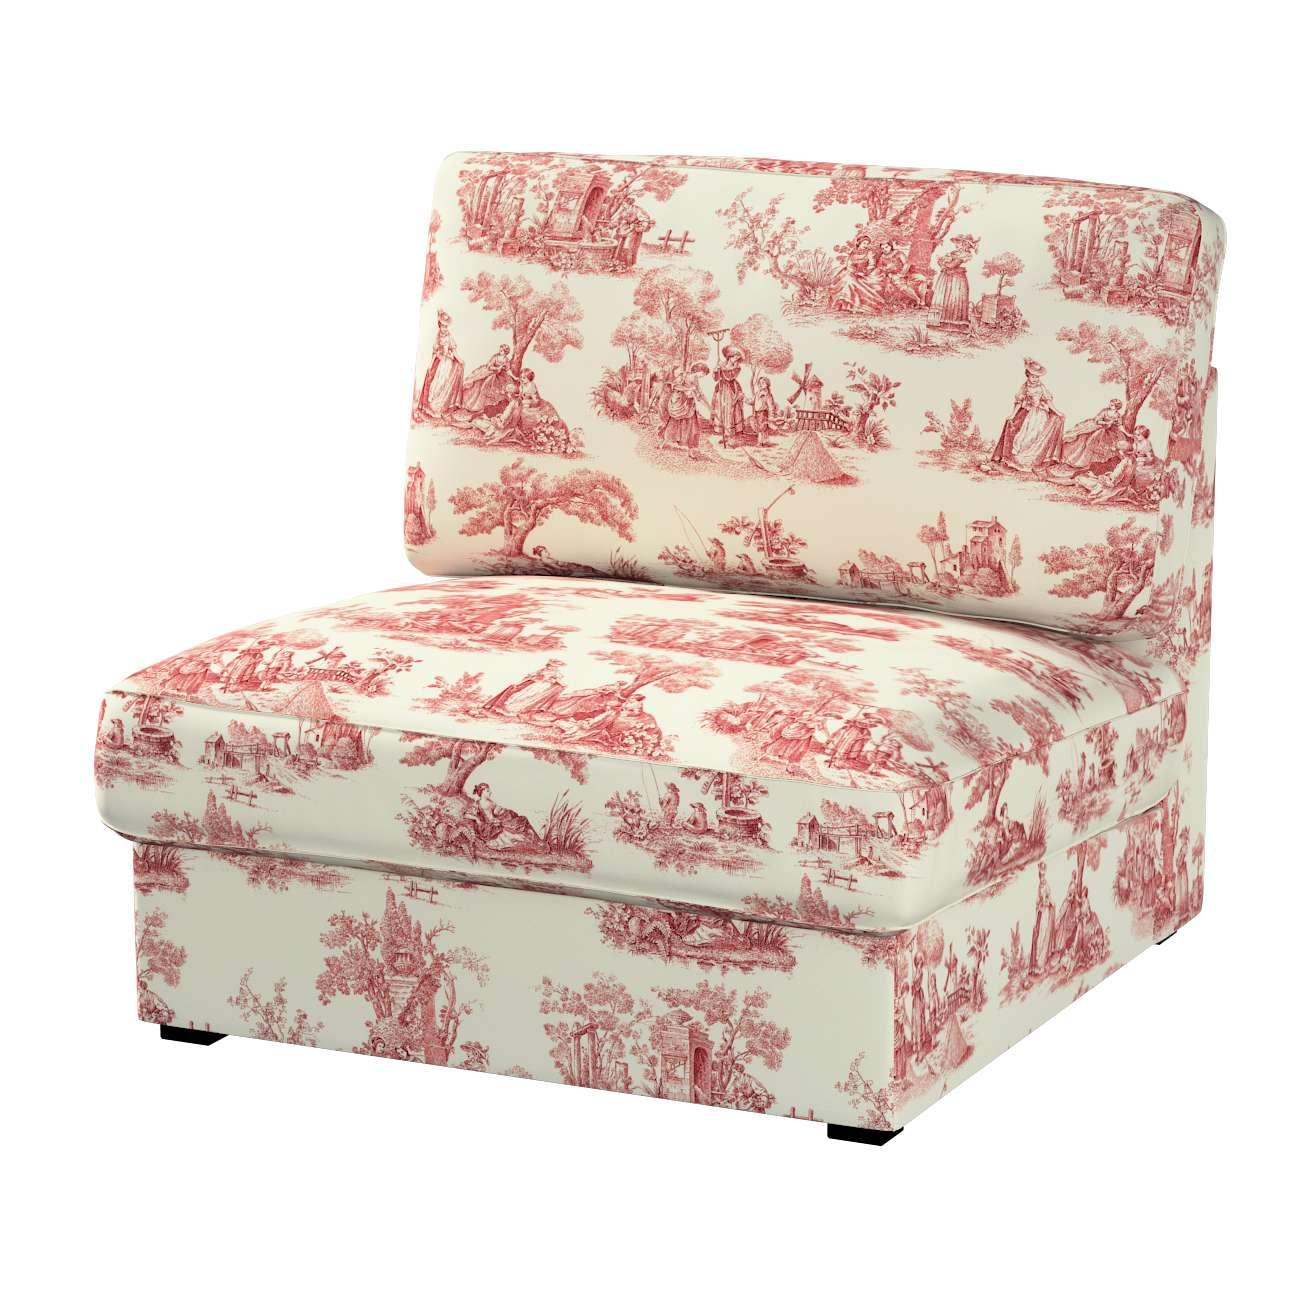 Pokrowiec na fotel Kivik Fotel Kivik w kolekcji Avinon, tkanina: 132-15